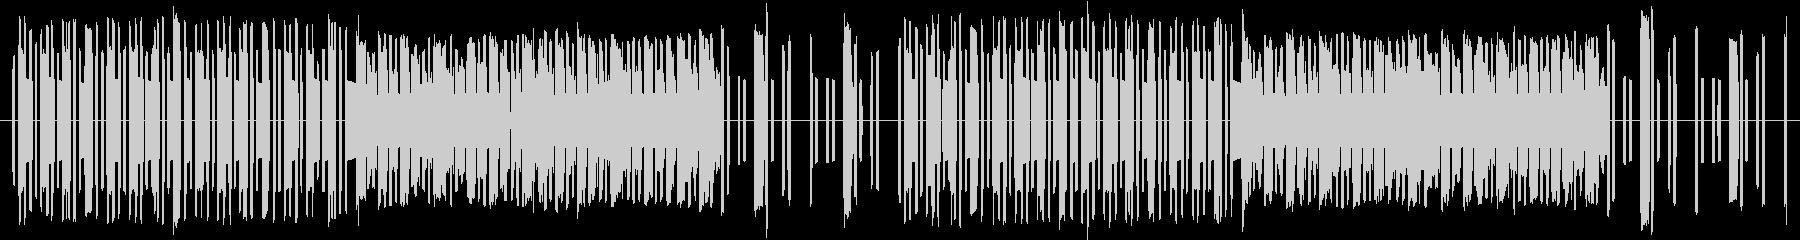 8bit風コミカルBGMの未再生の波形